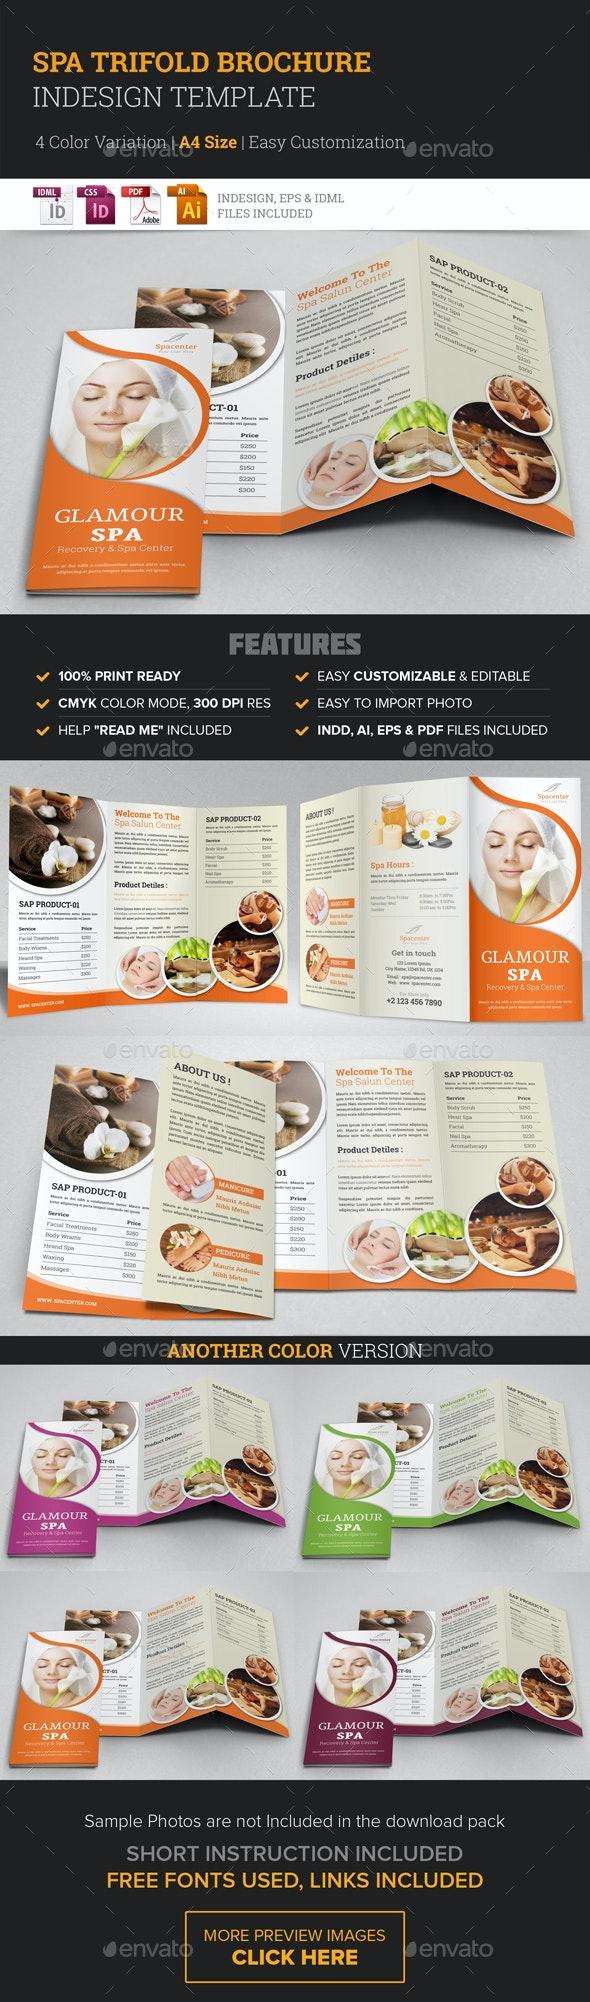 Spa & Beauty Salon Trifold Brochure 2 - Corporate Brochures